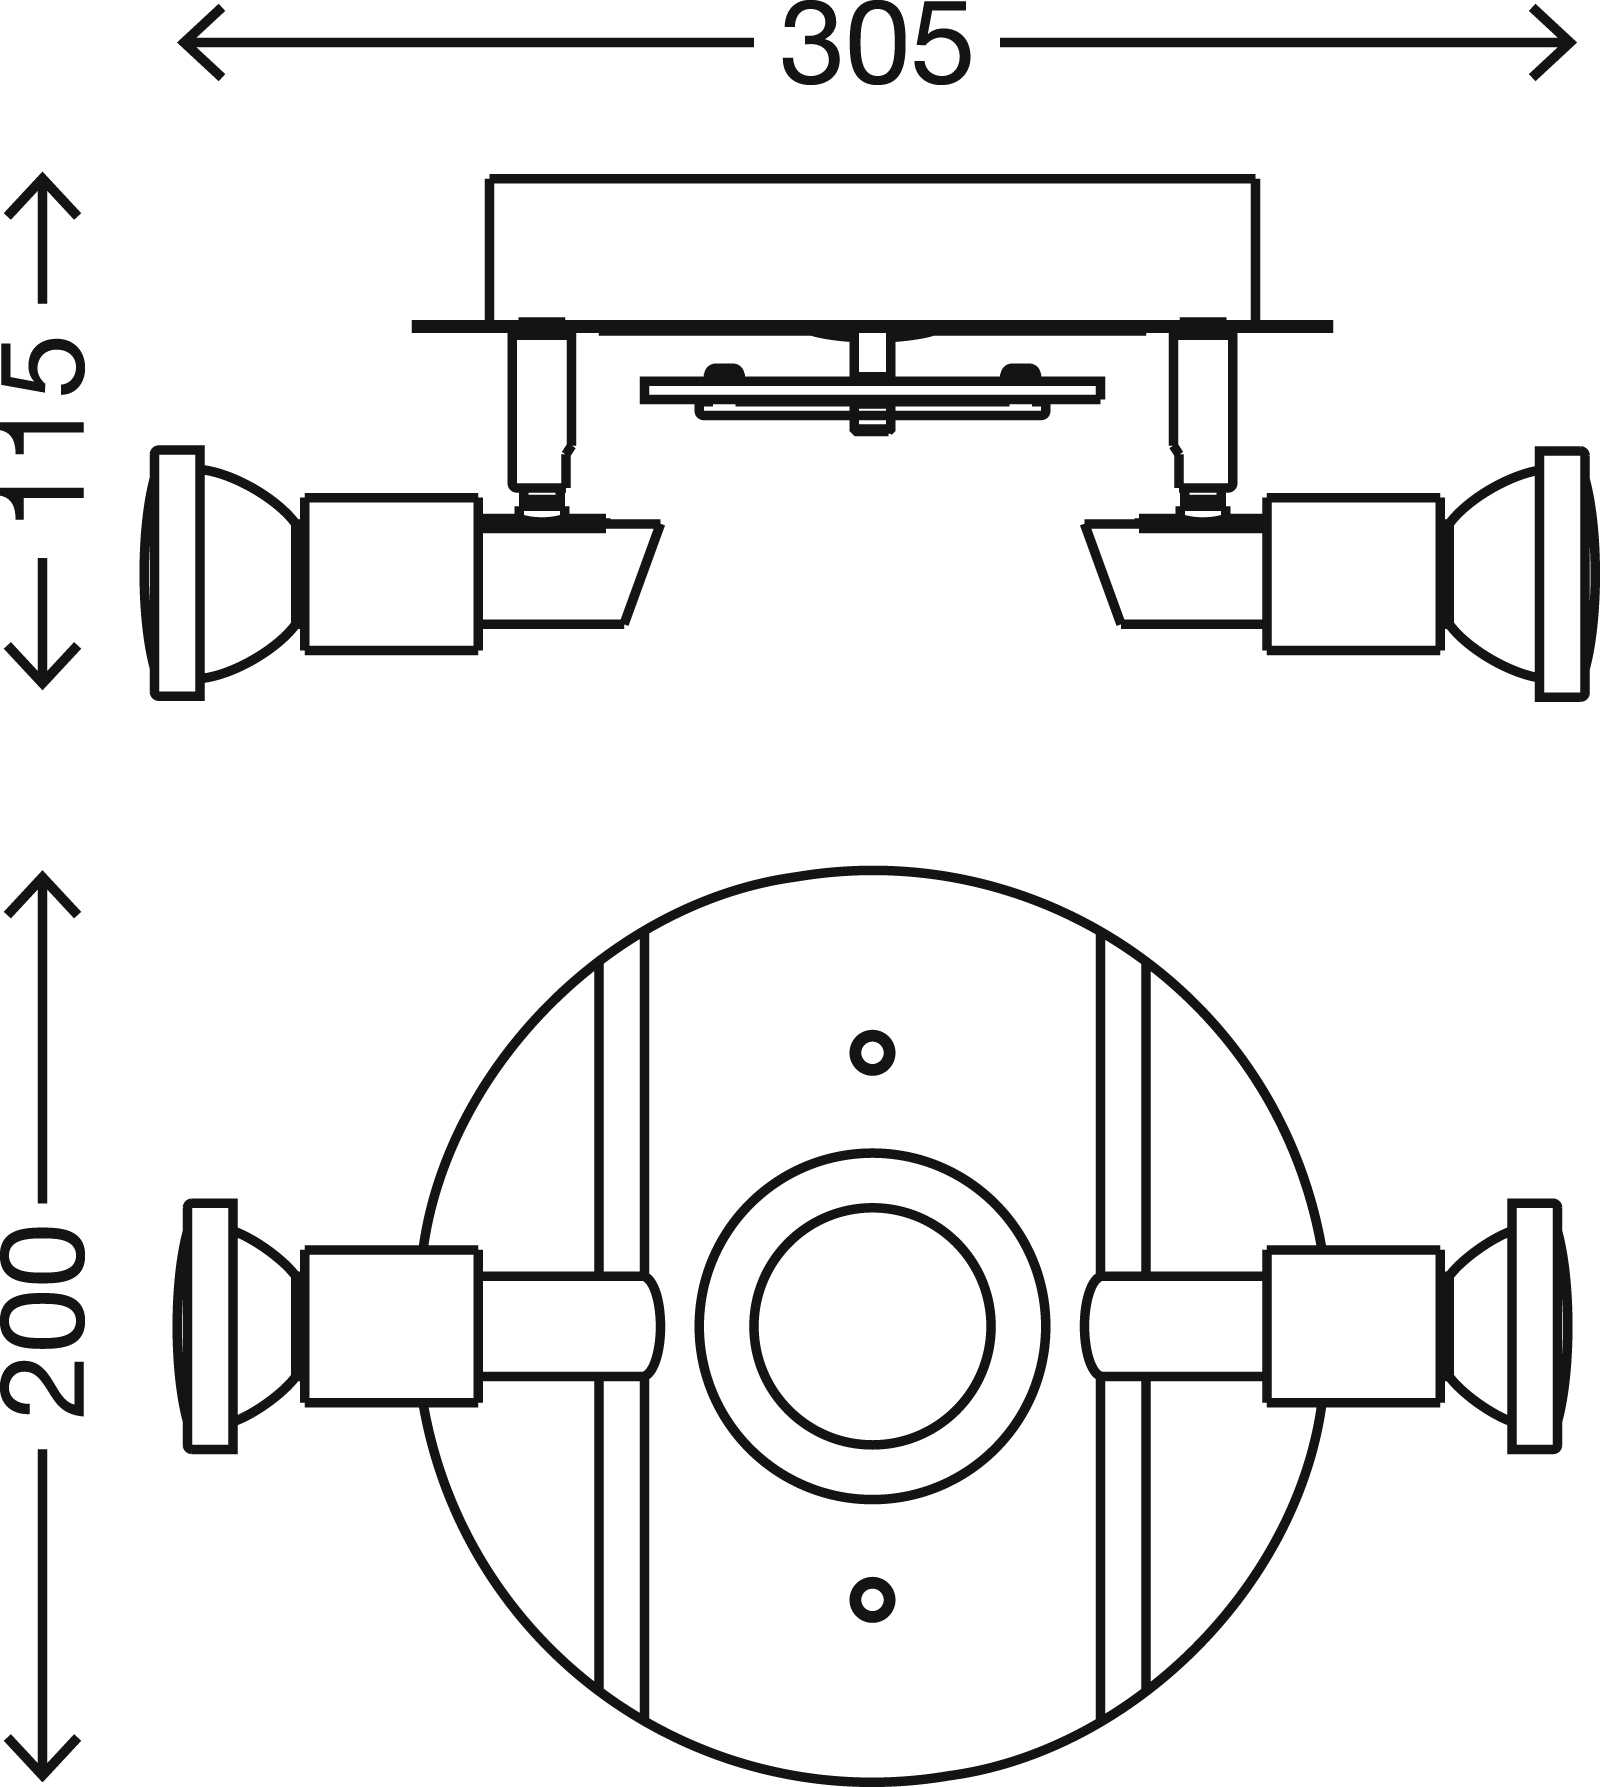 LED Spot Deckenleuchte, Ø 20 cm, 11 W, Matt-Nickel